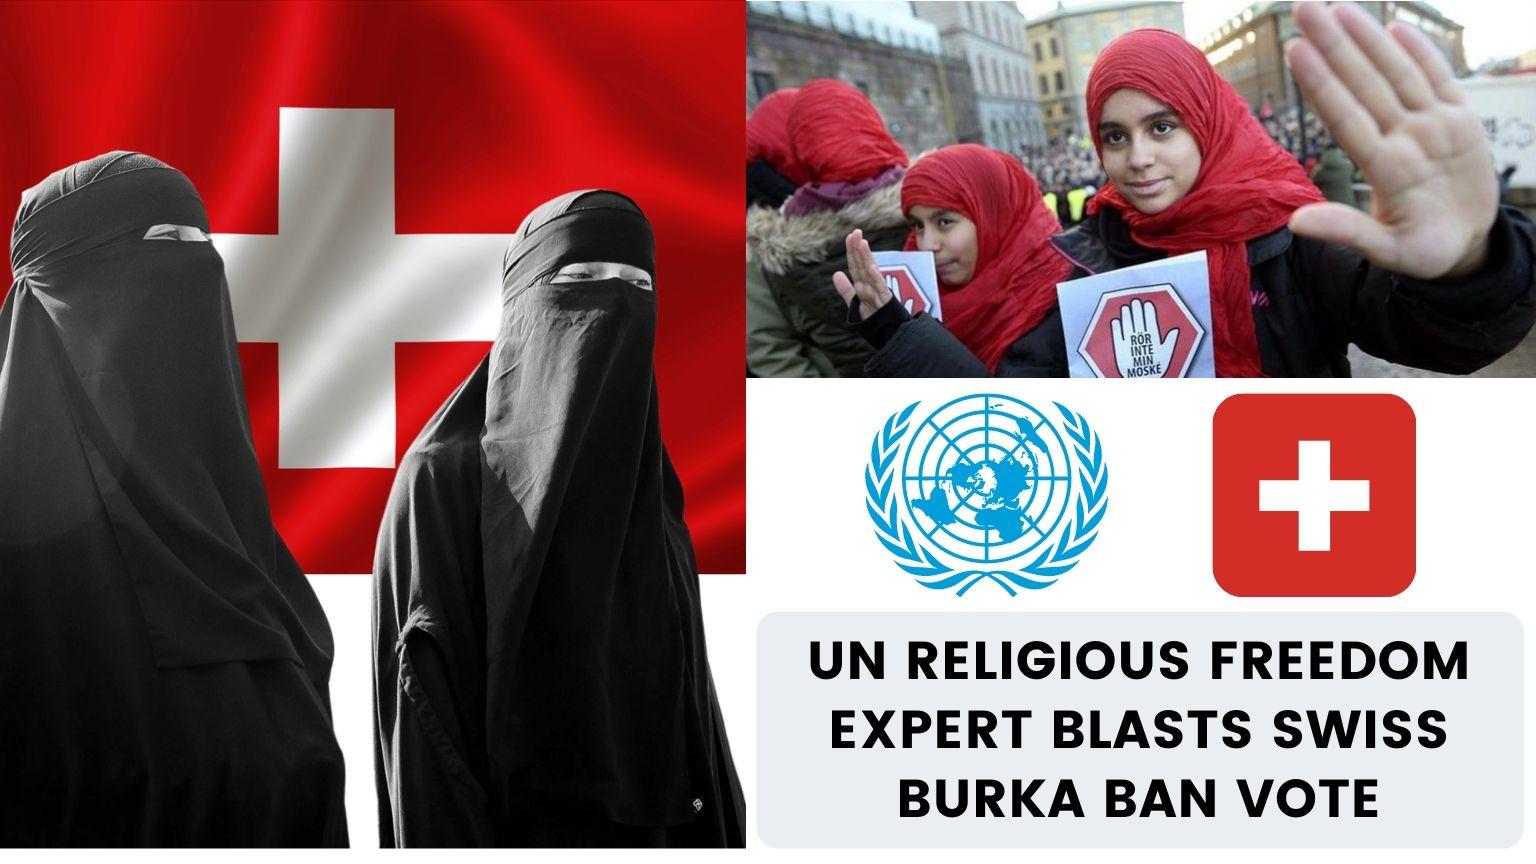 UN Religious Freedom Expert Blasts Swiss Burka Ban Vote 🇨🇭